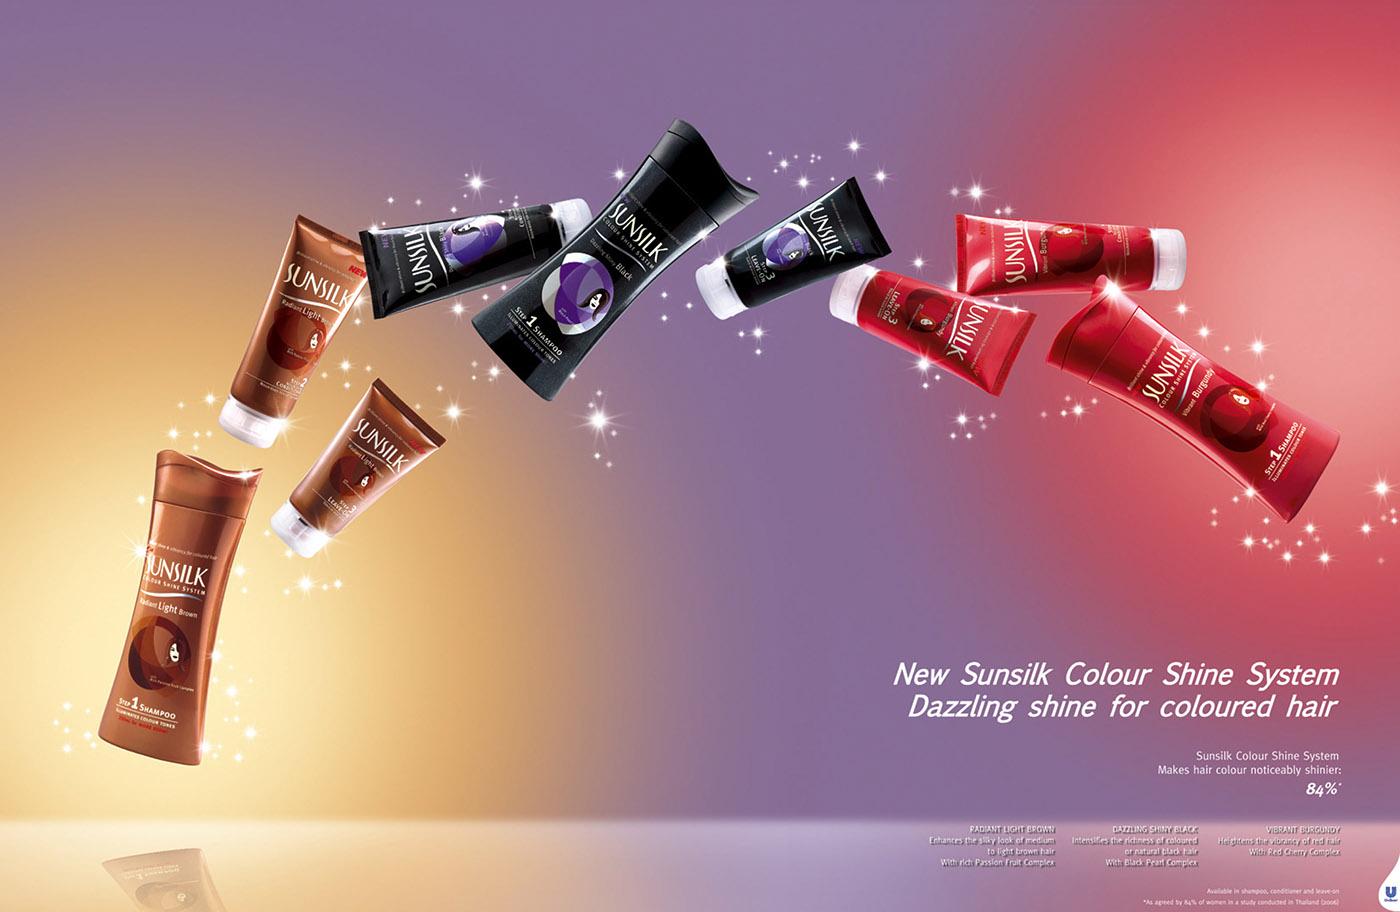 Sunsilk Magazine Ads on Behance